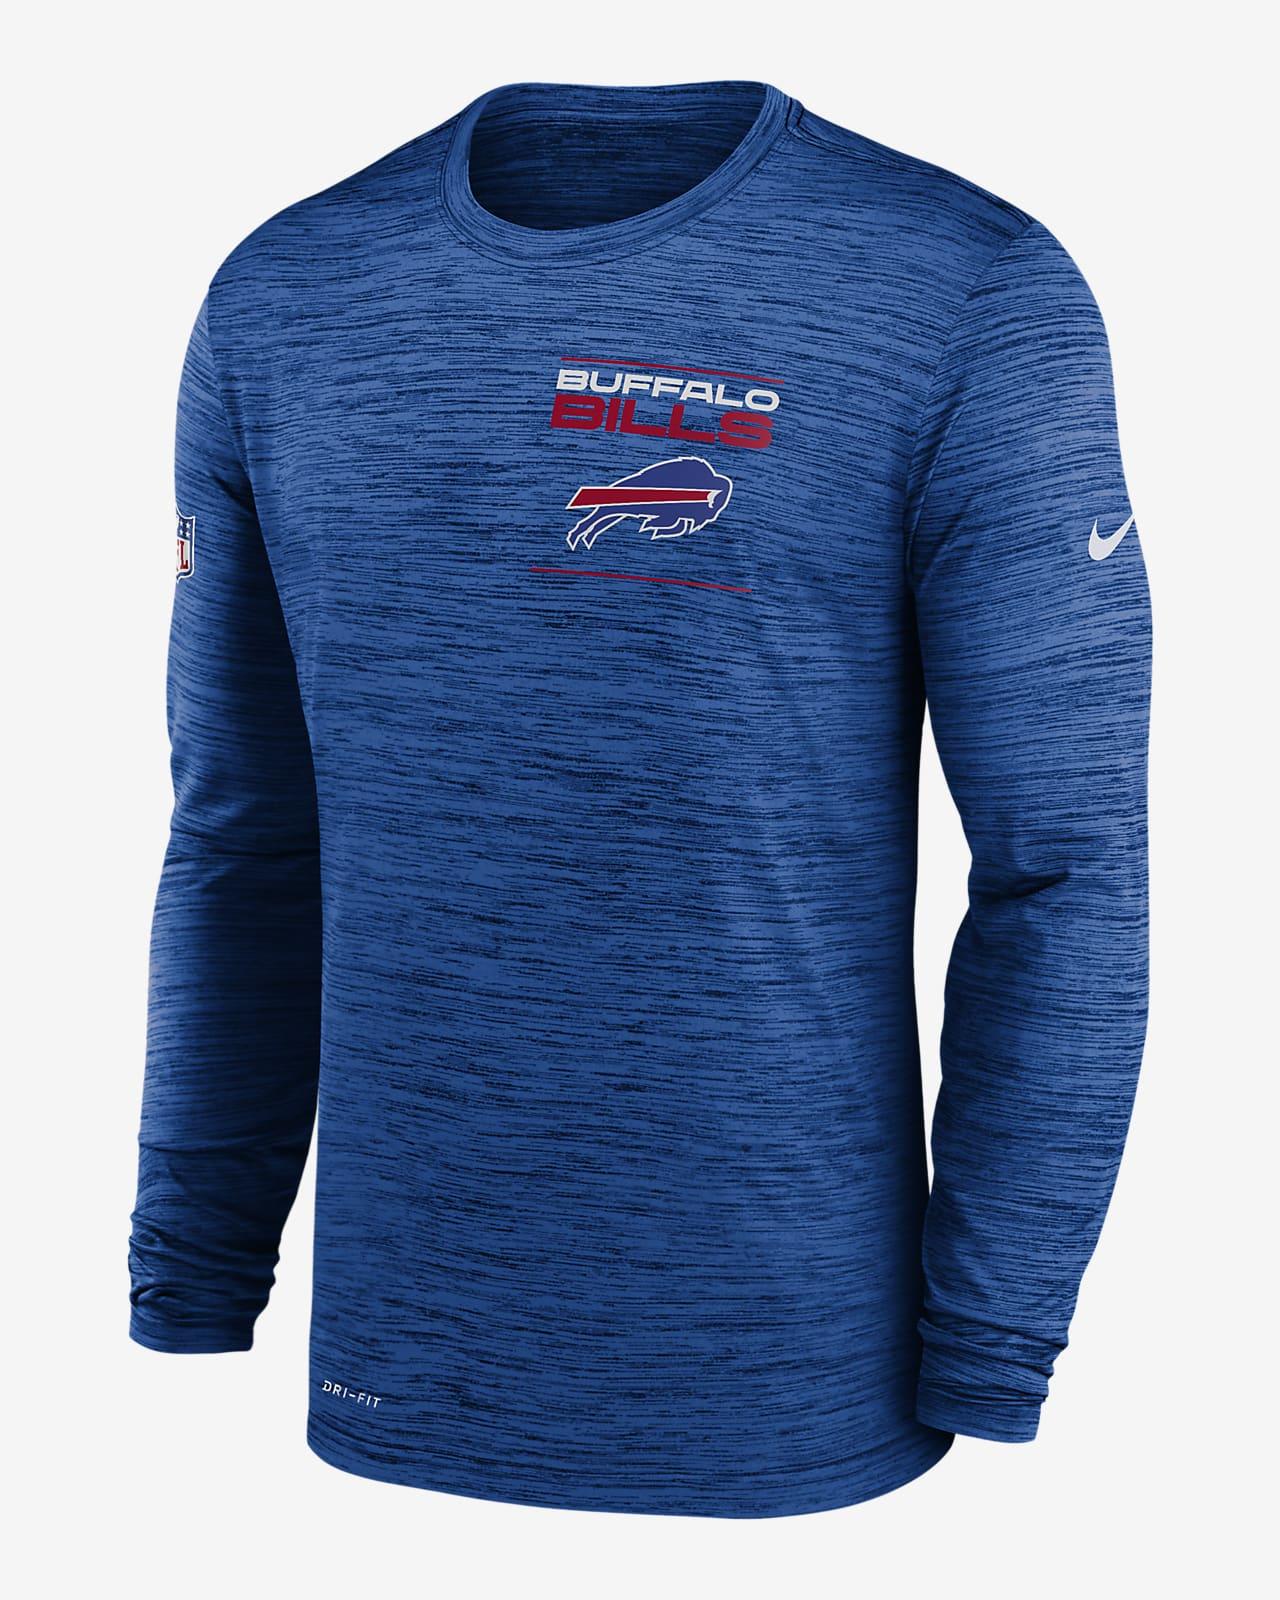 Nike Dri-FIT Sideline Velocity Legend (NFL Buffalo Bills) Men's Long-Sleeve T-Shirt